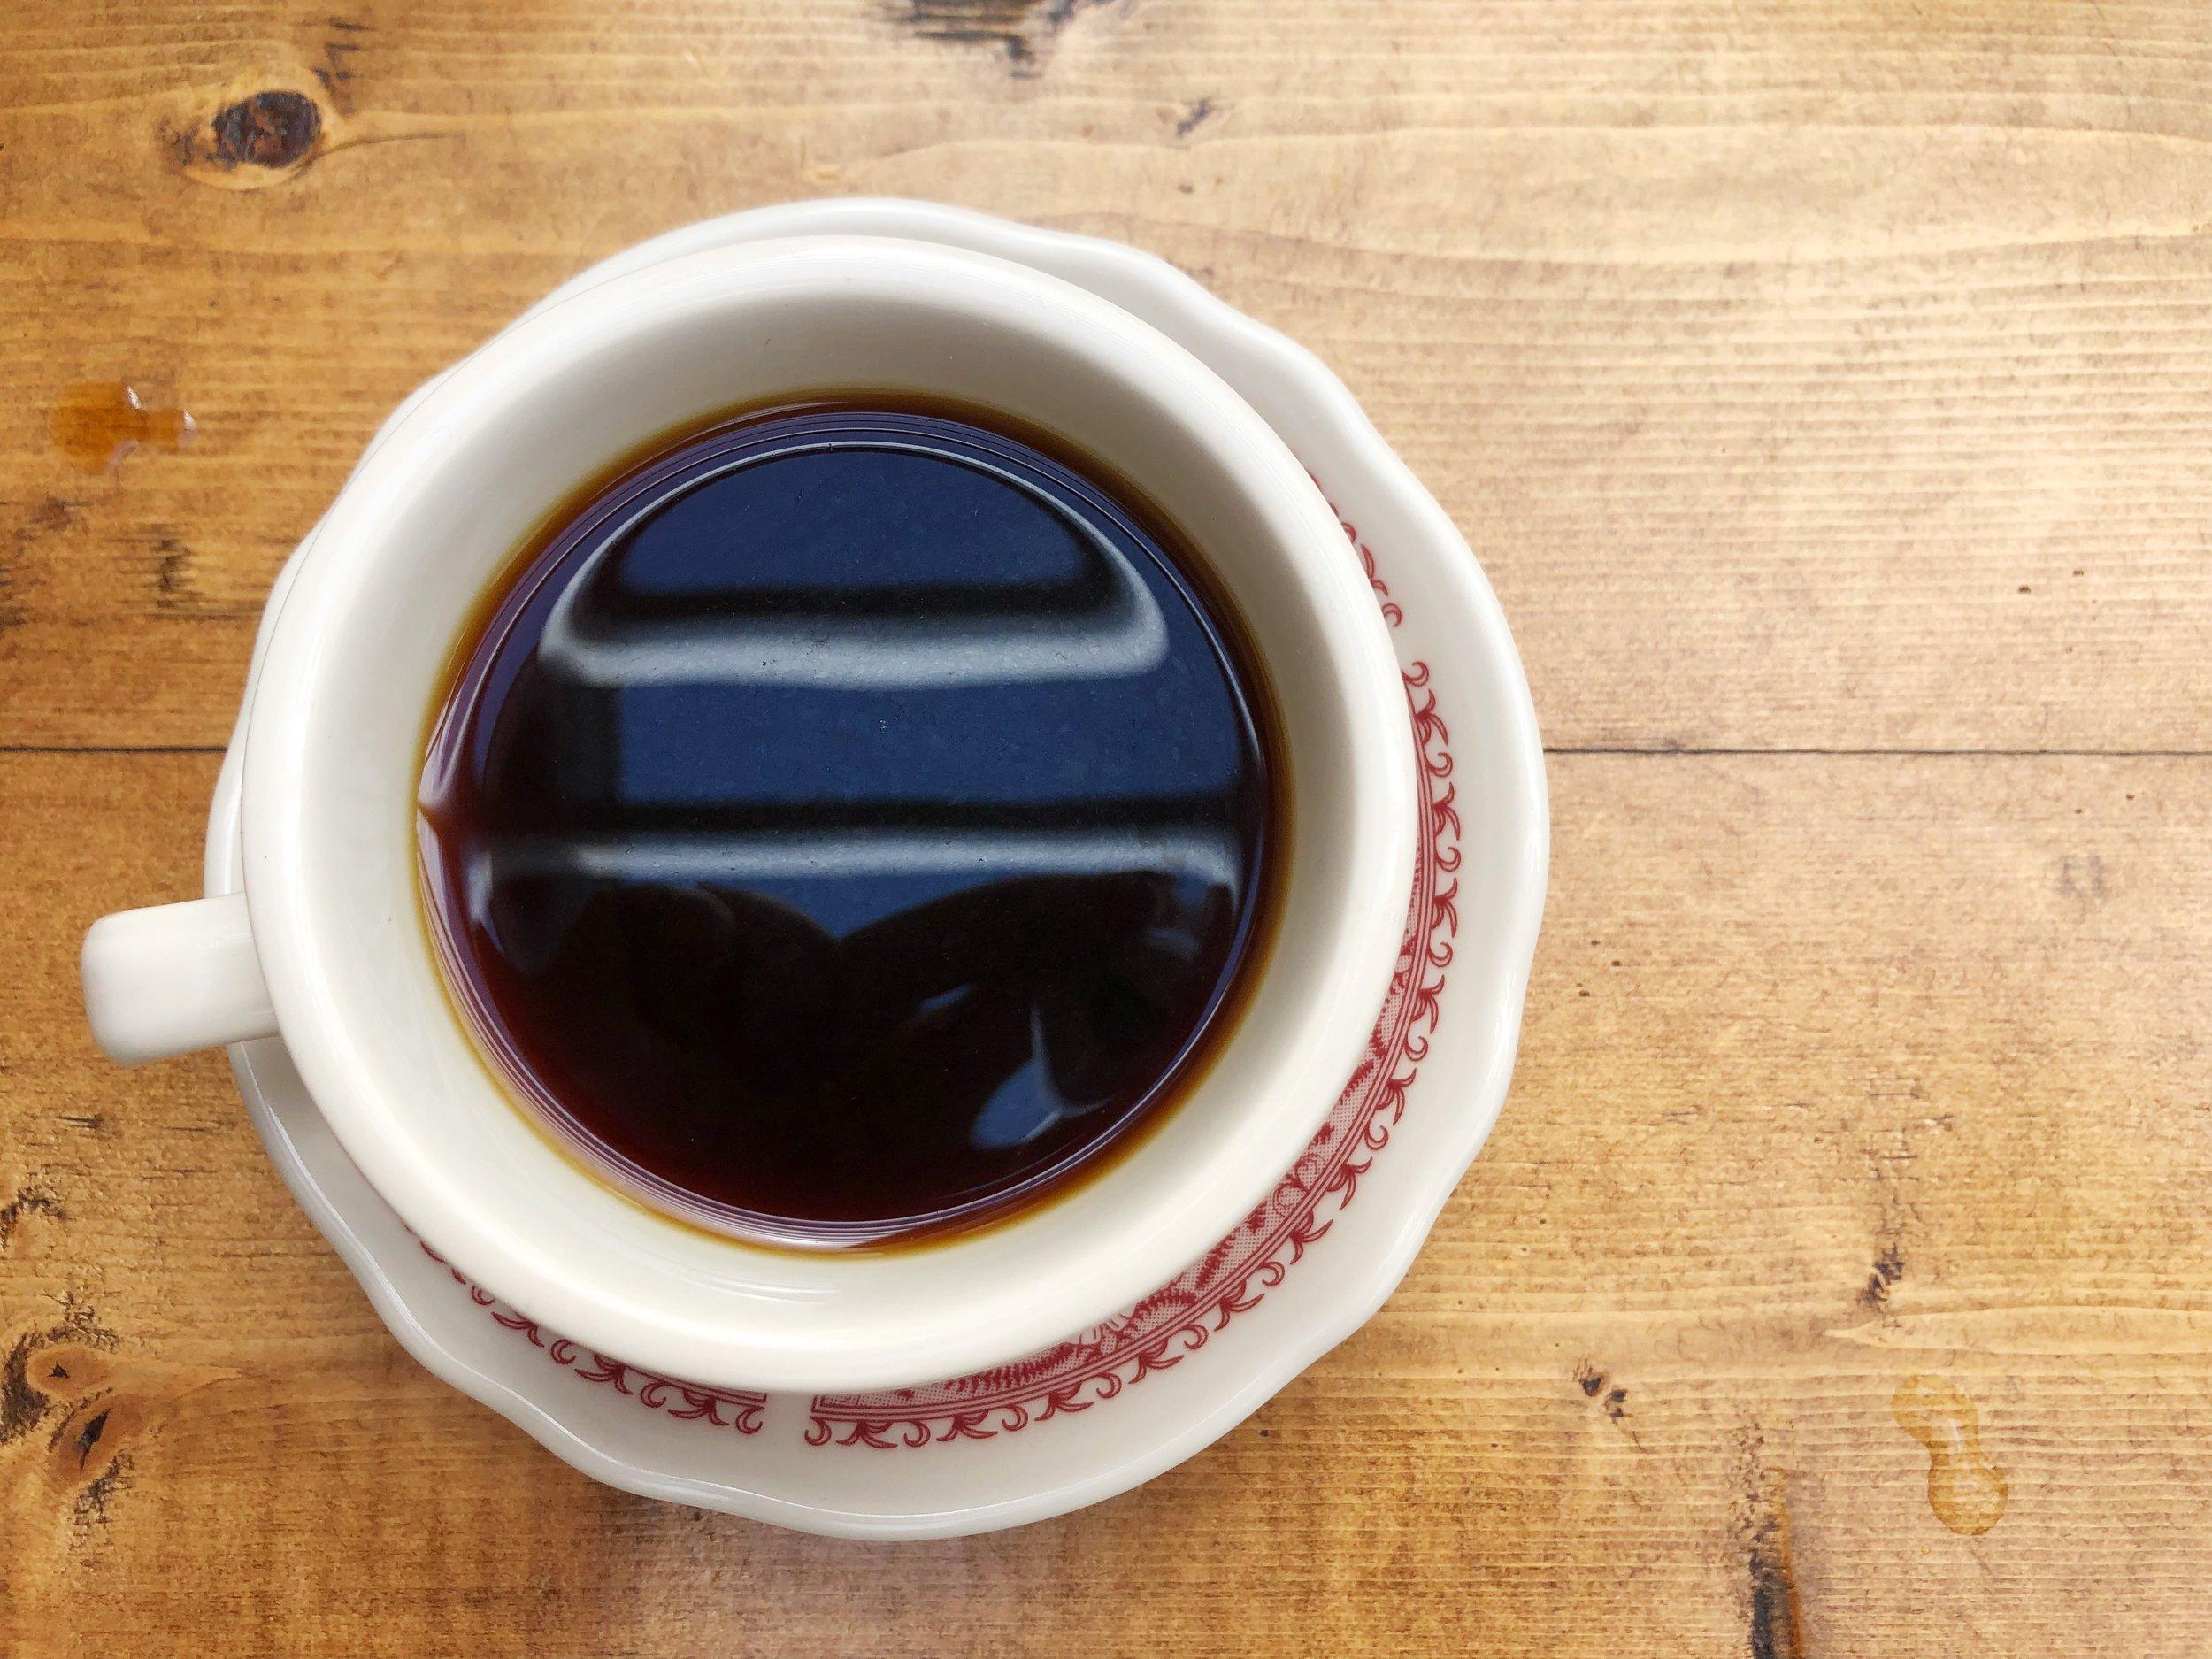 haberdish-noda-charlotte-nc-brunch-coffee